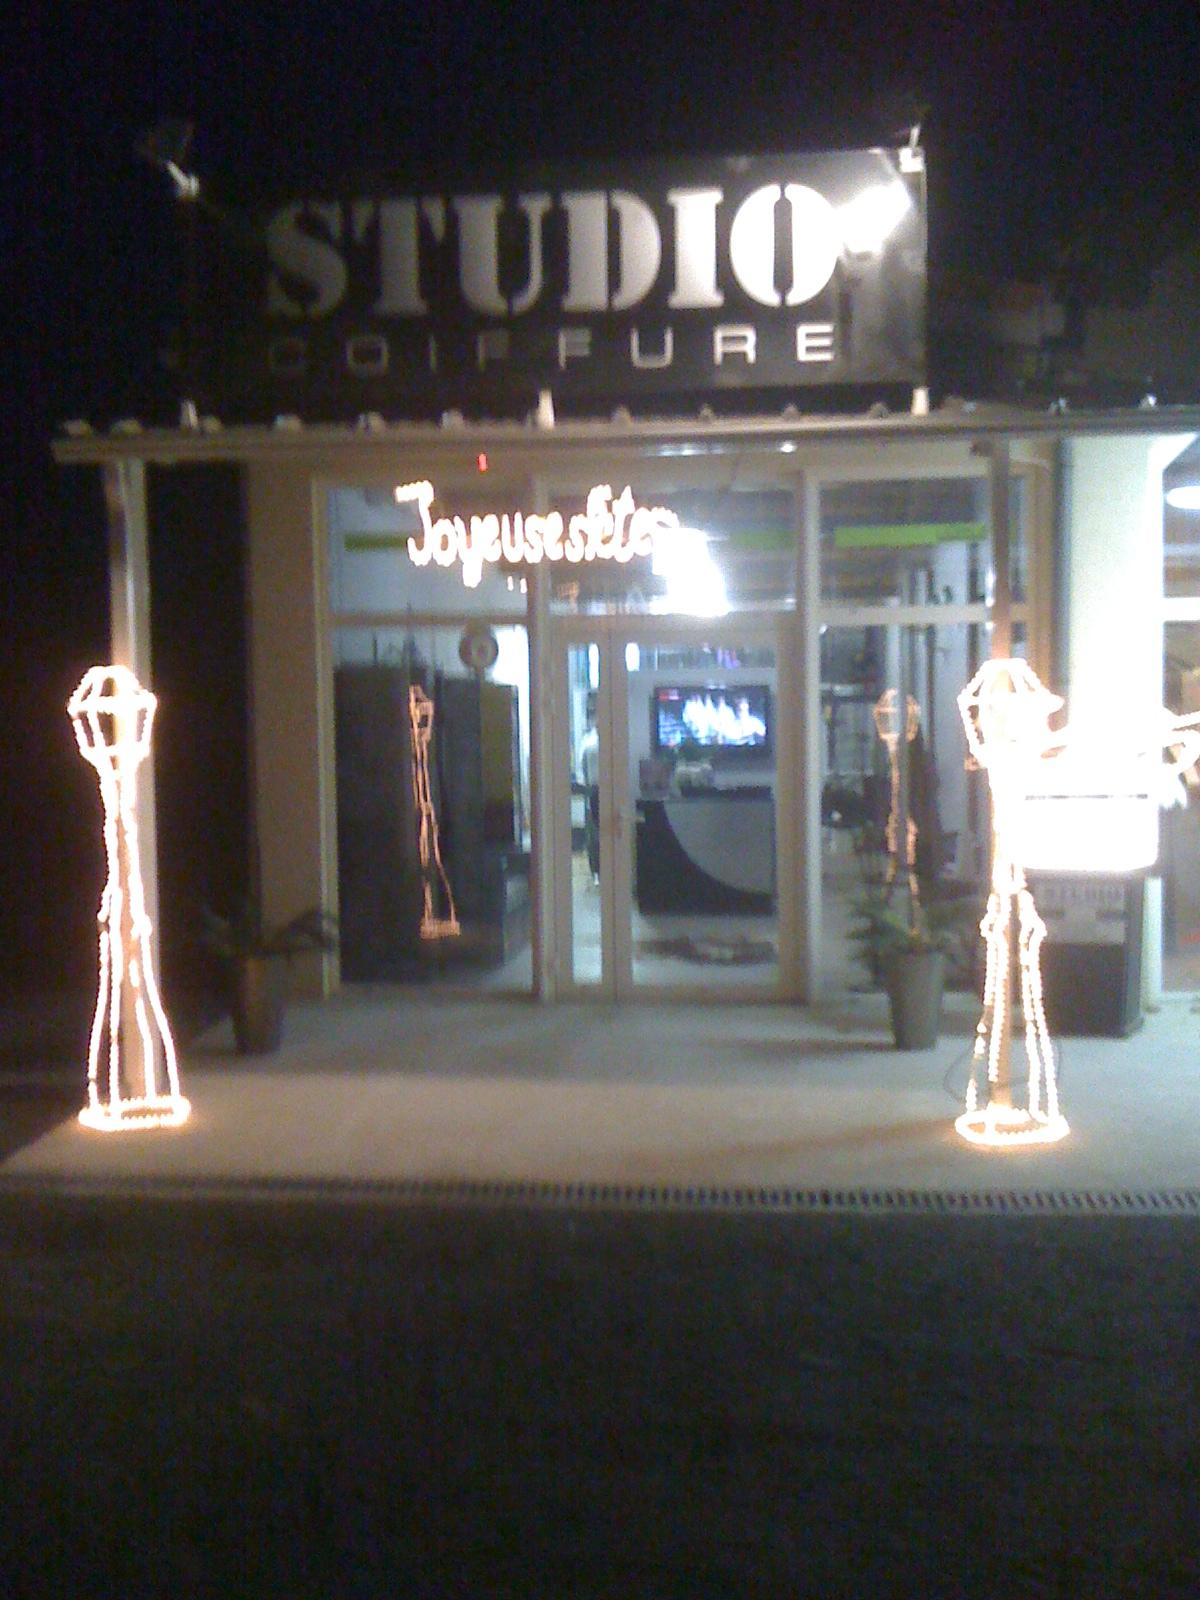 Studio coiffure Homme à Graulhet